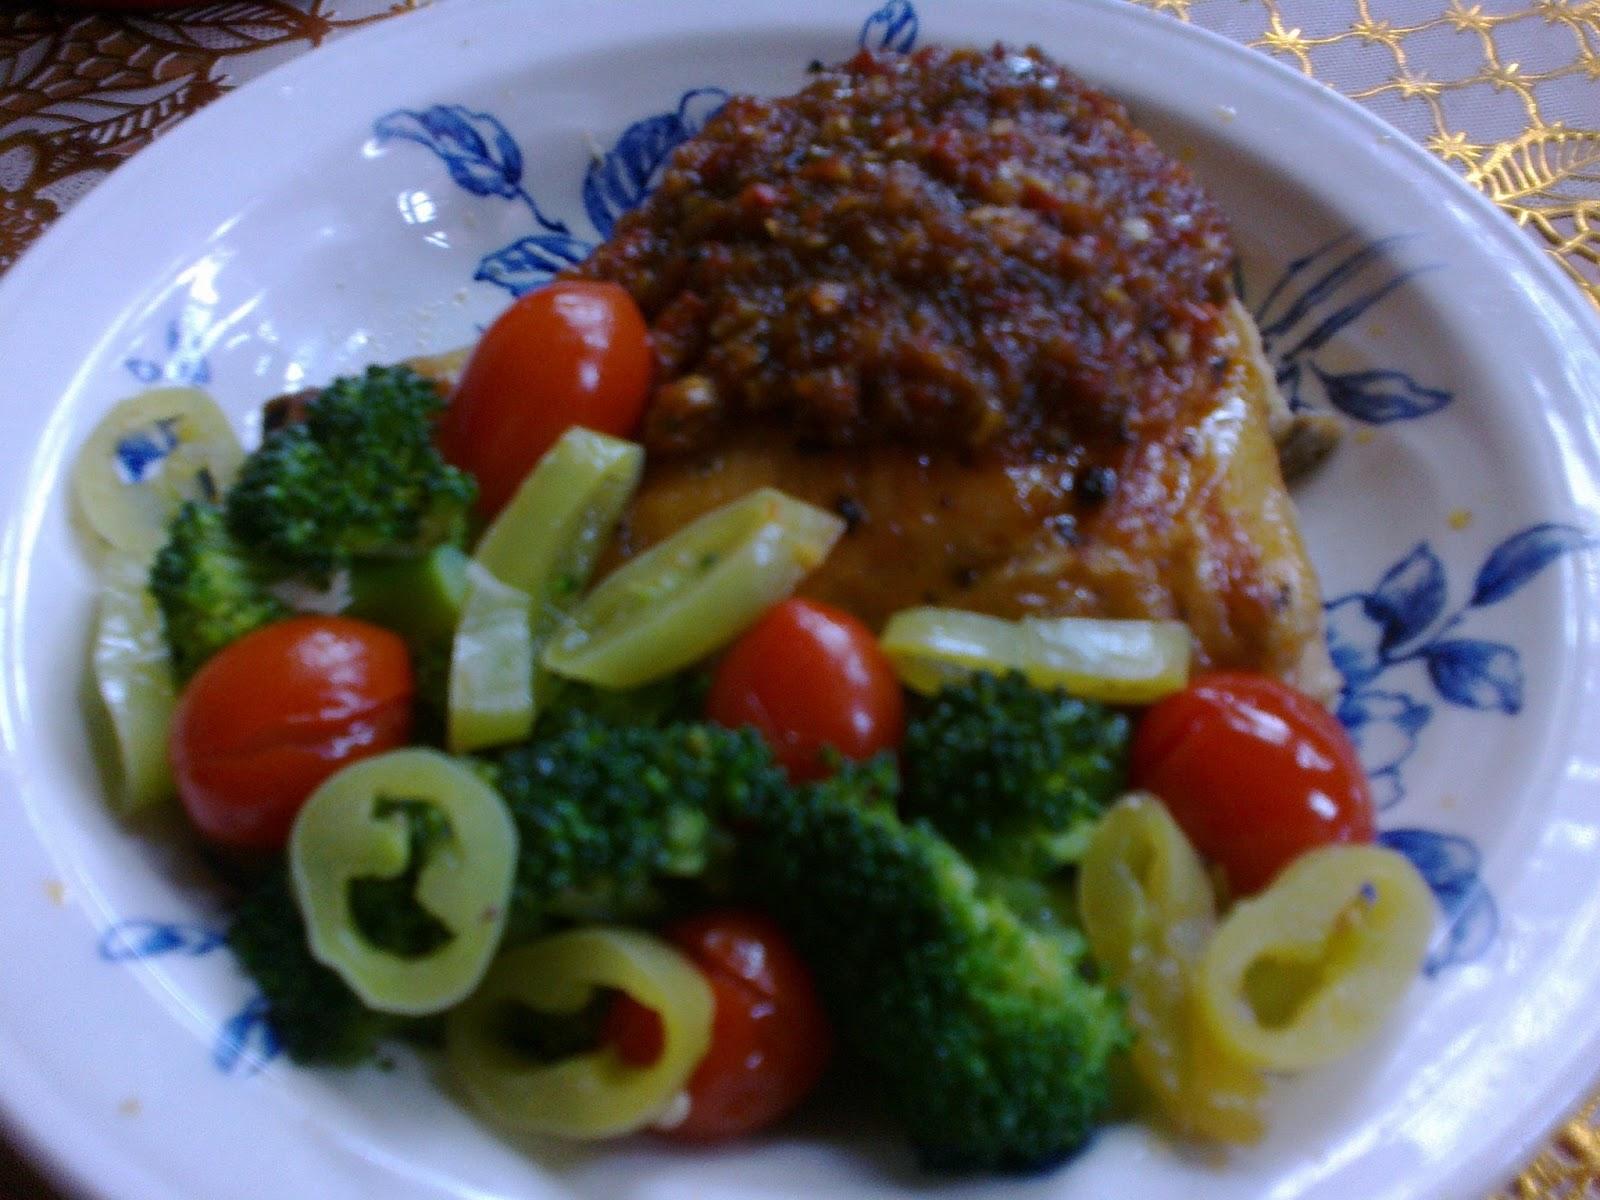 Video: Resepi Ayam Halia Versi Diet